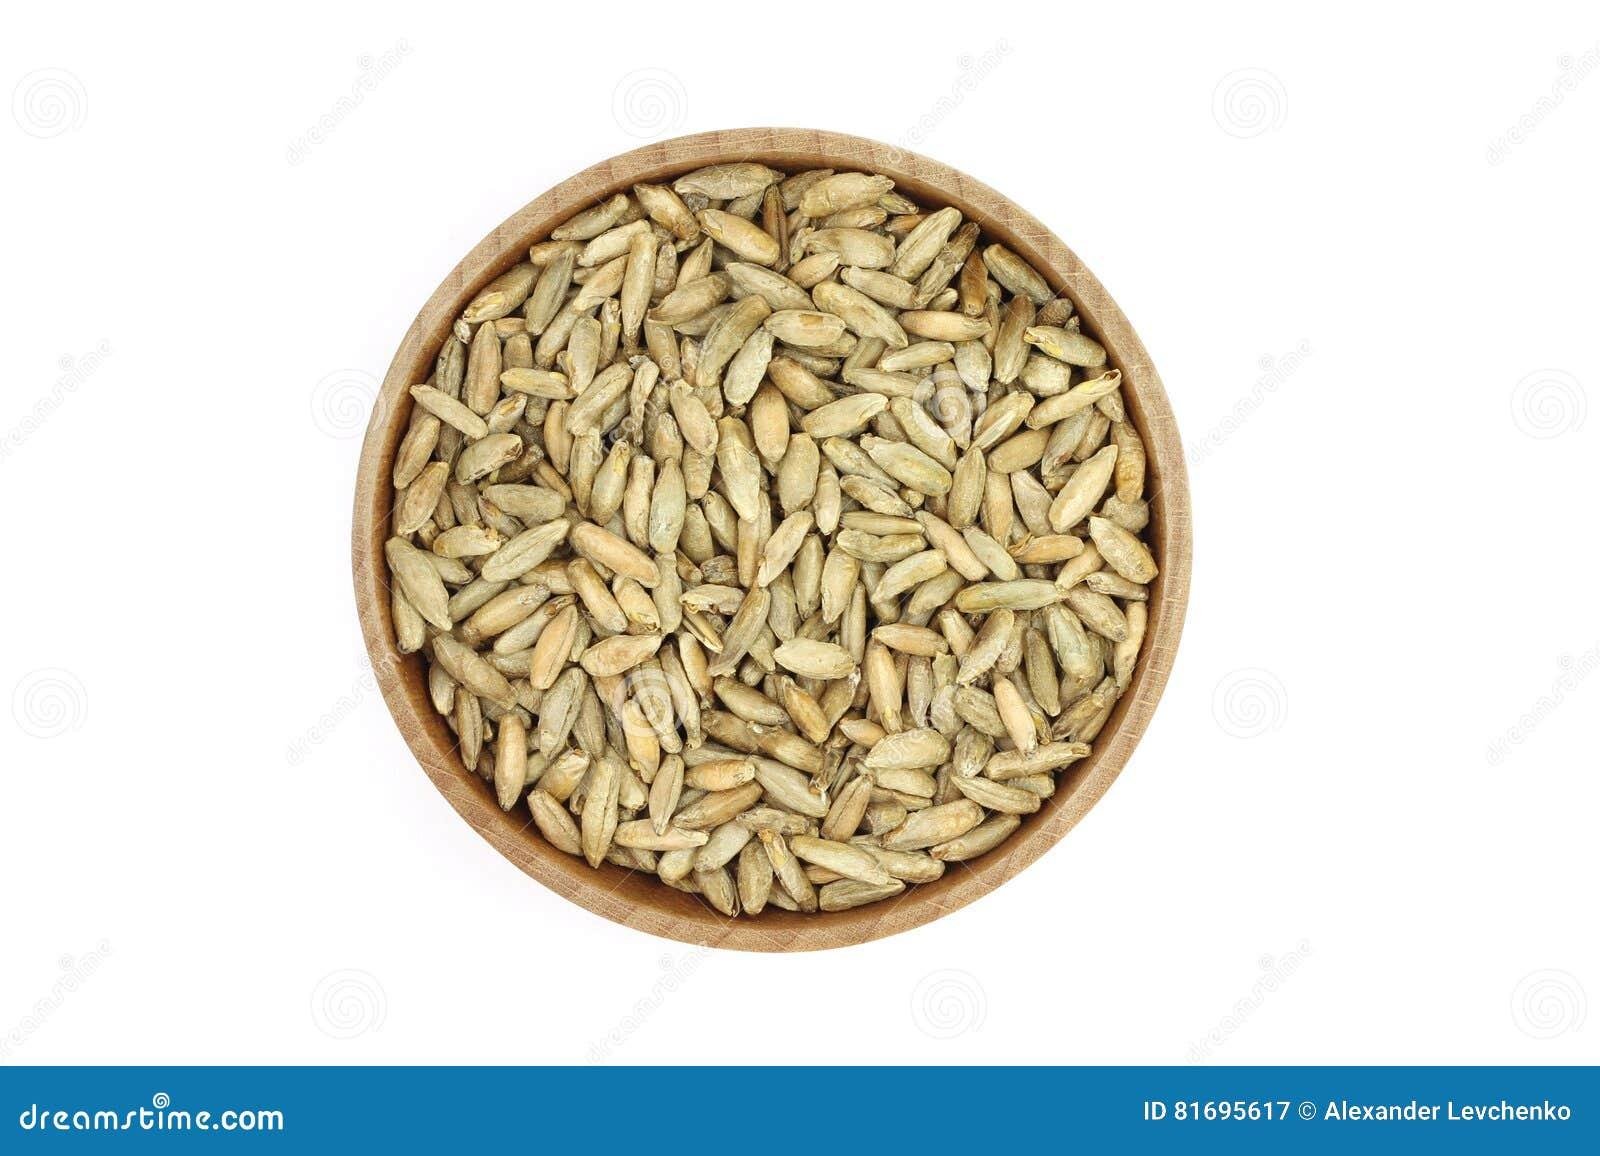 Grain rye malt in a wooden container